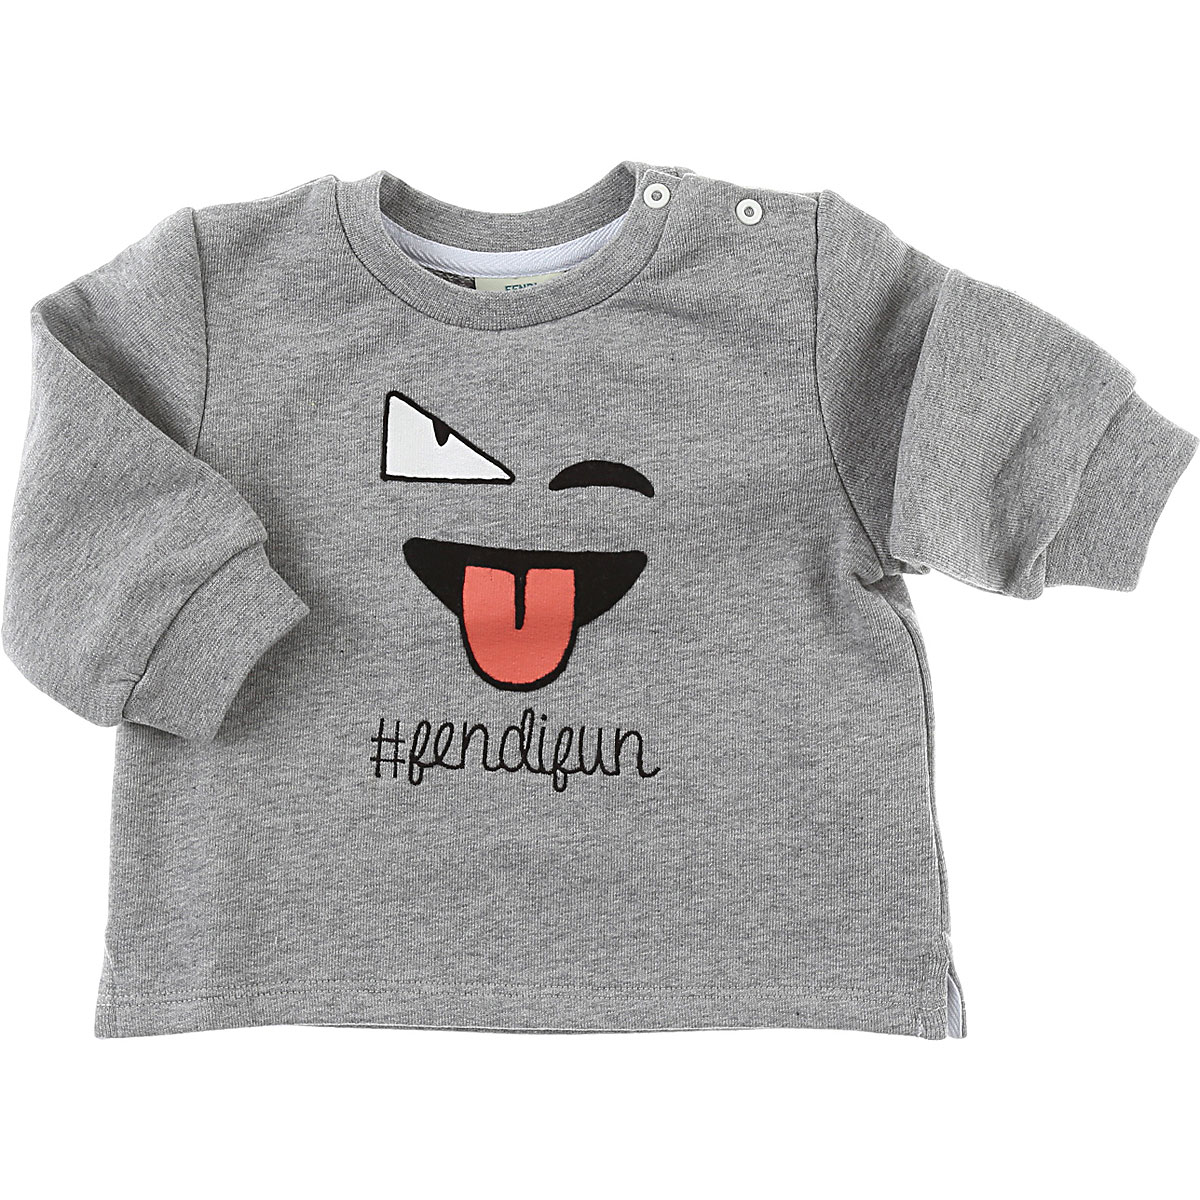 Image of Fendi Baby Sweatshirts & Hoodies for Girls, Grey, Cotton, 2017, 12M 18M 2Y 3M 6M 9M